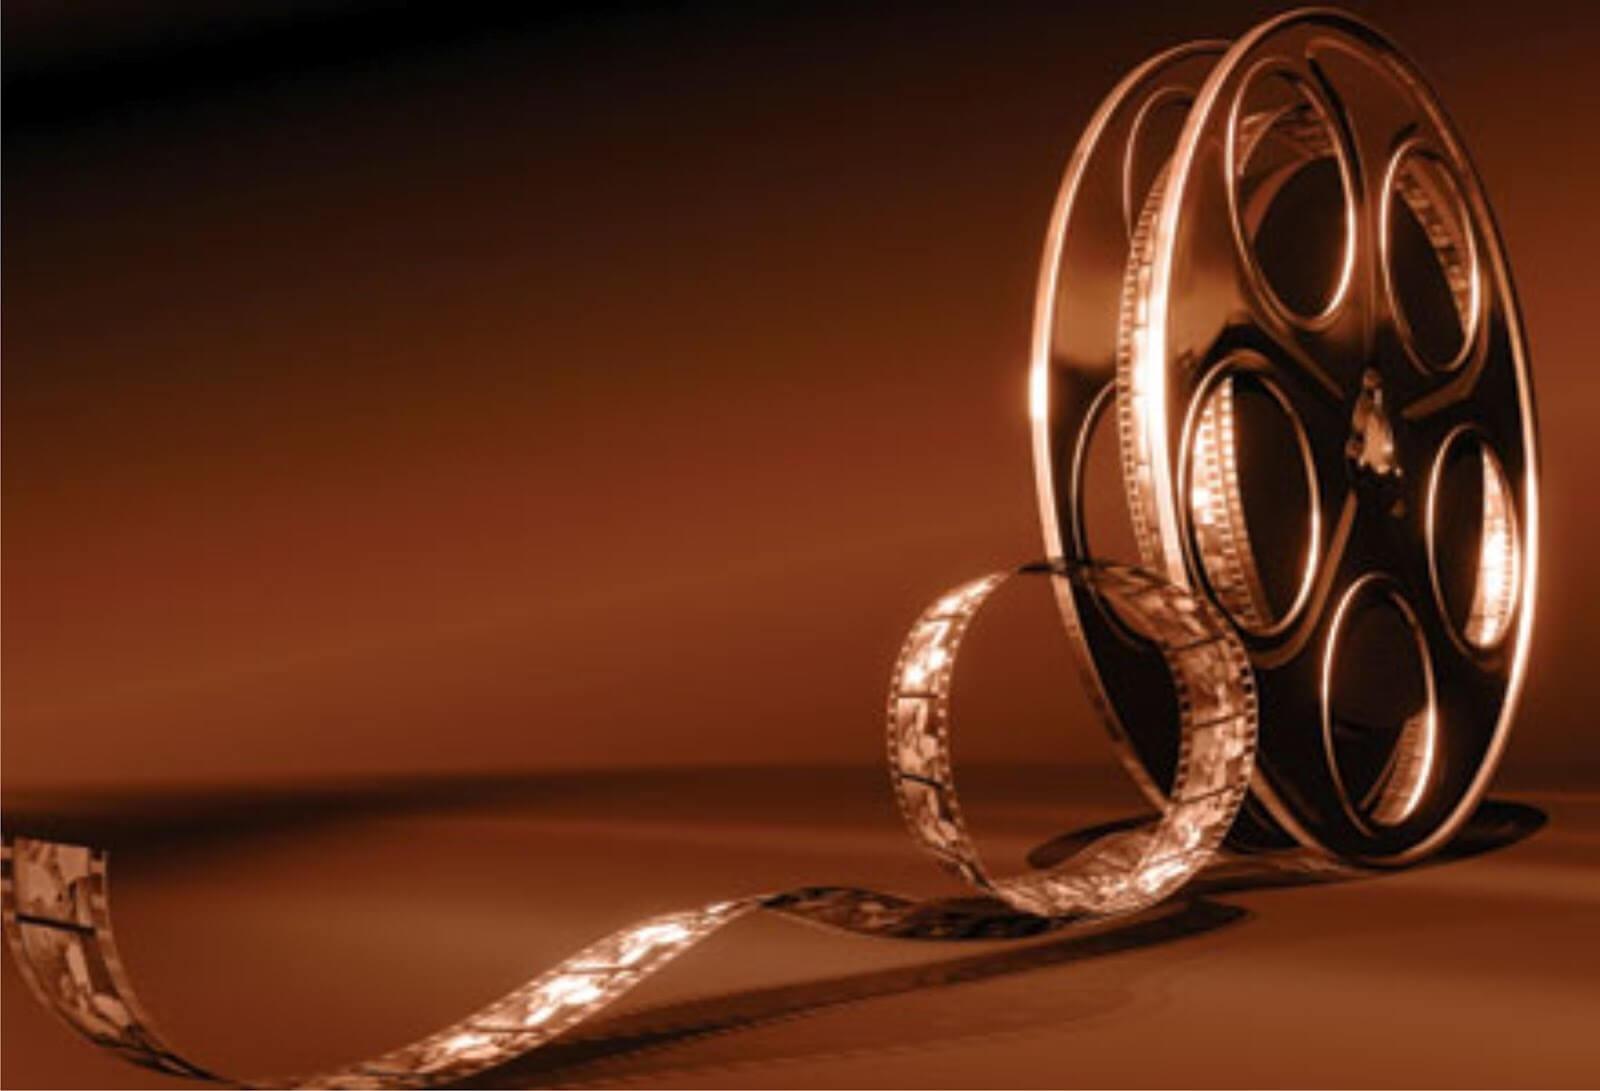 film streaming gratis italiano siti